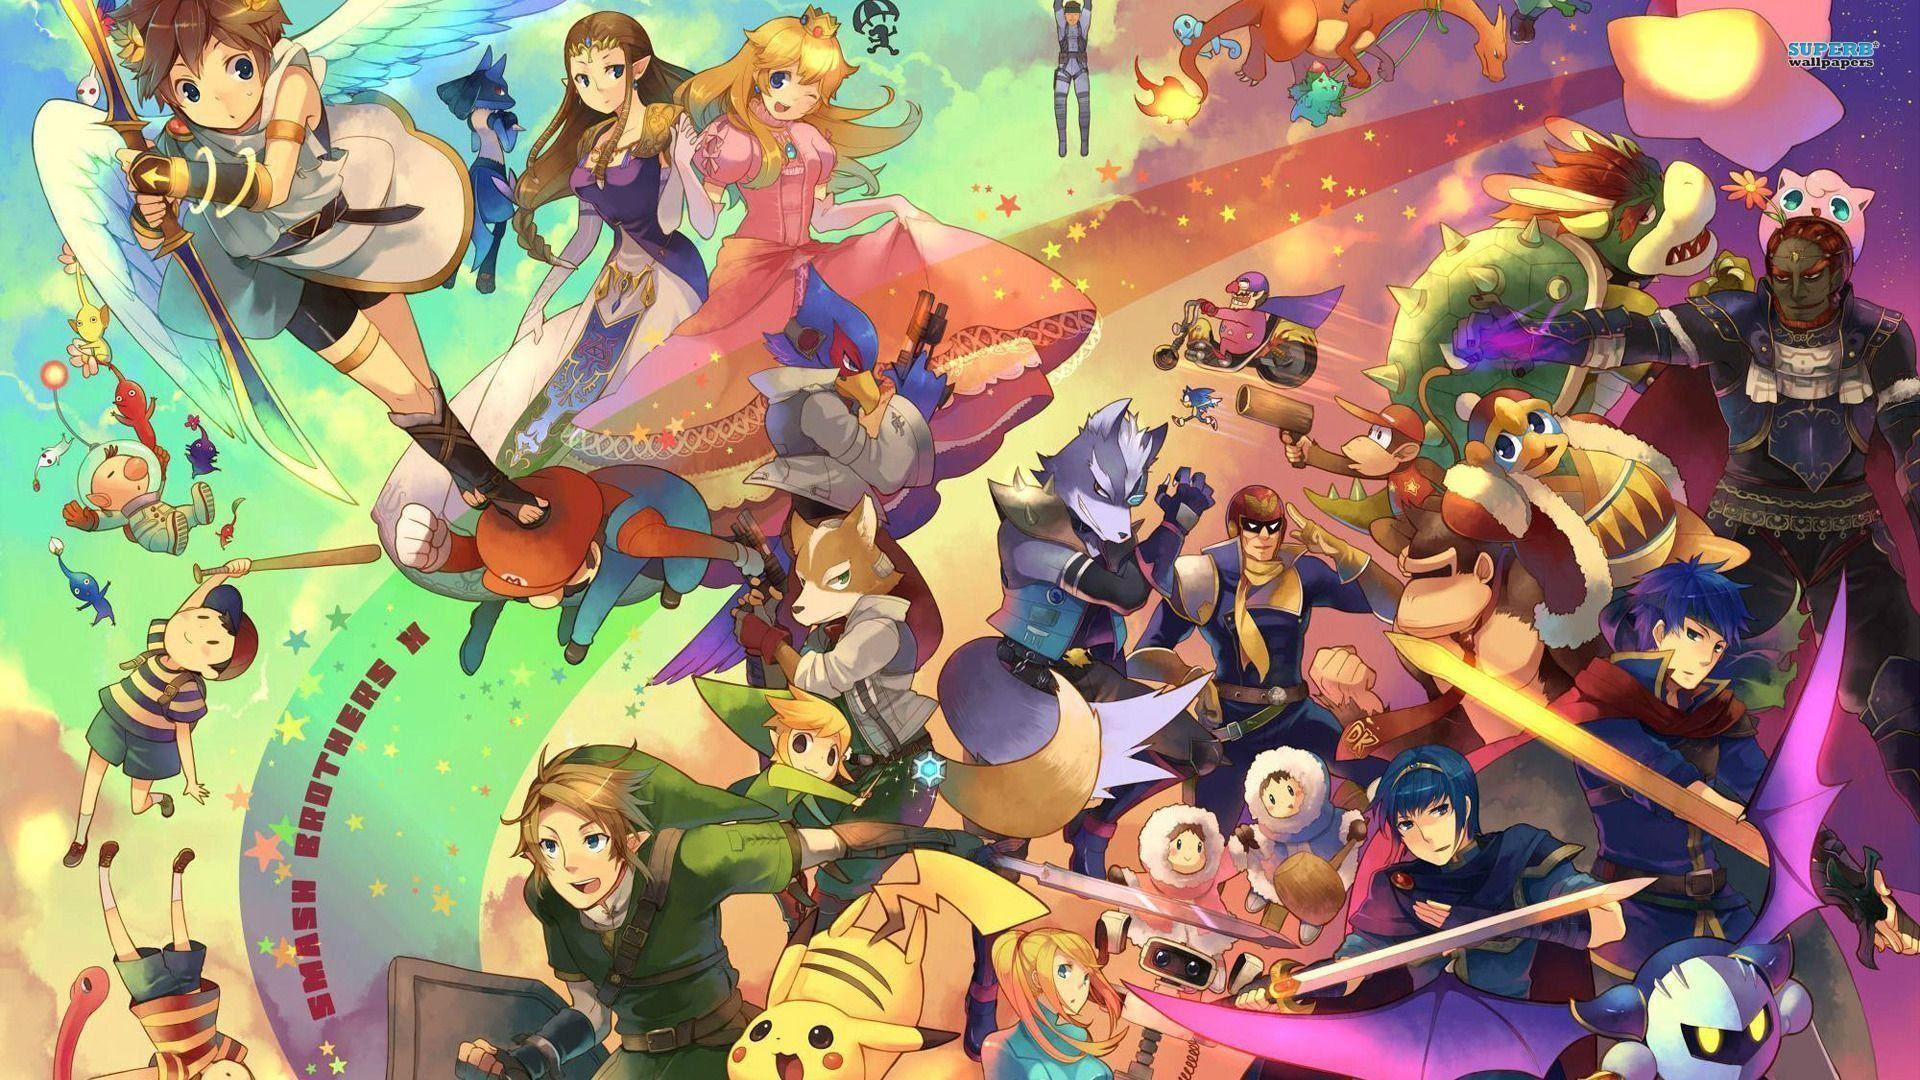 Super Smash Brothers Wallpaper 75 Images